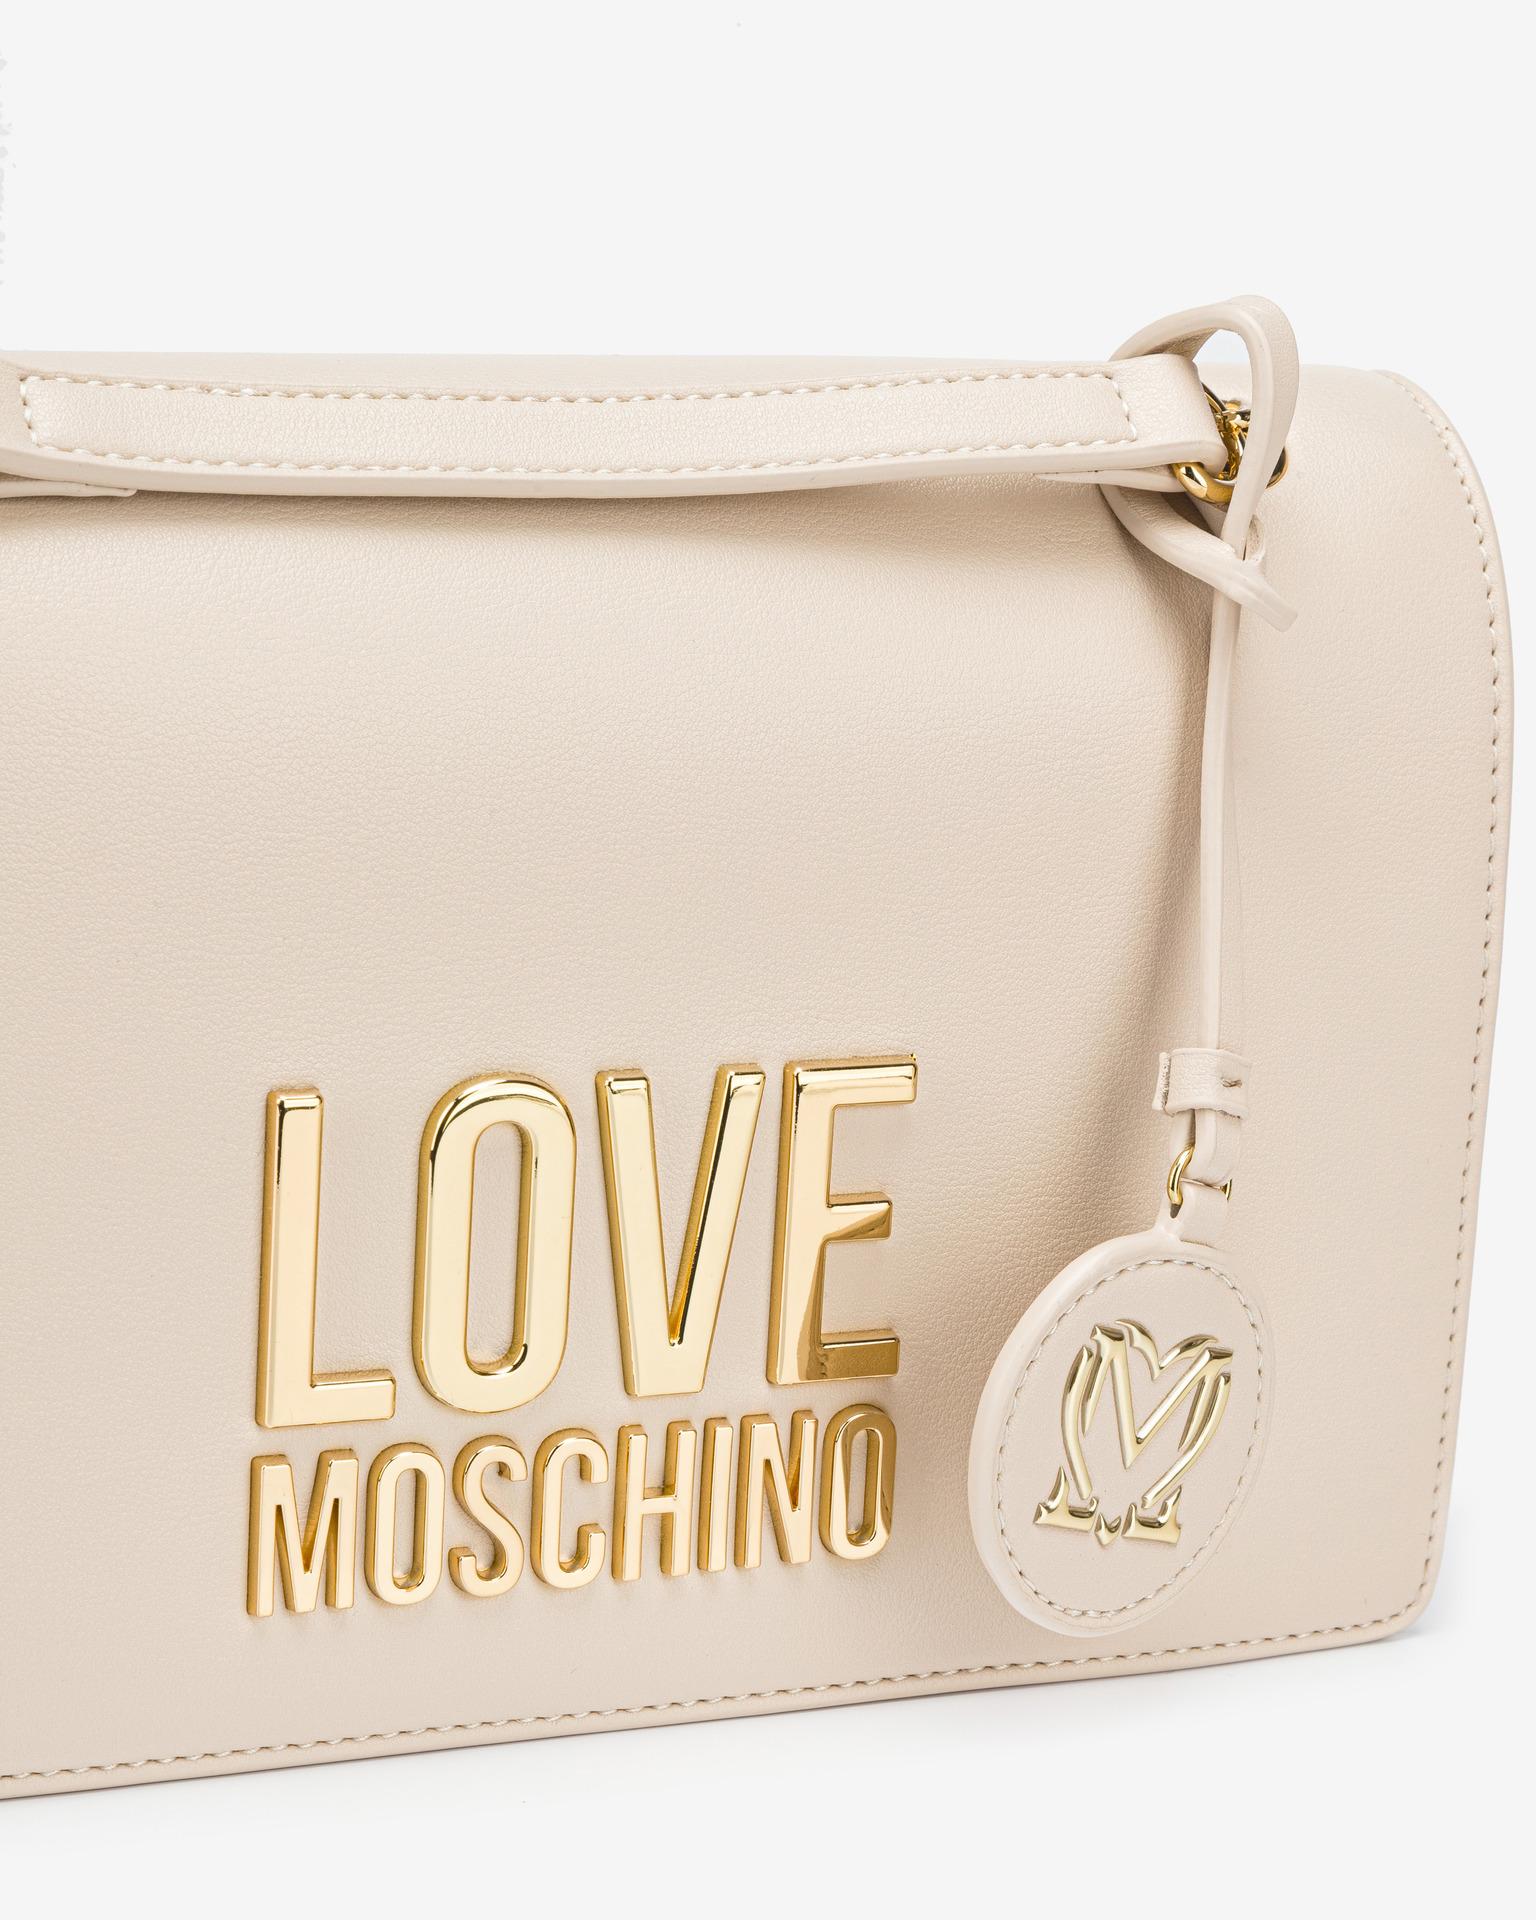 Love Moschino Чанта за през рамо Byal Bezhov